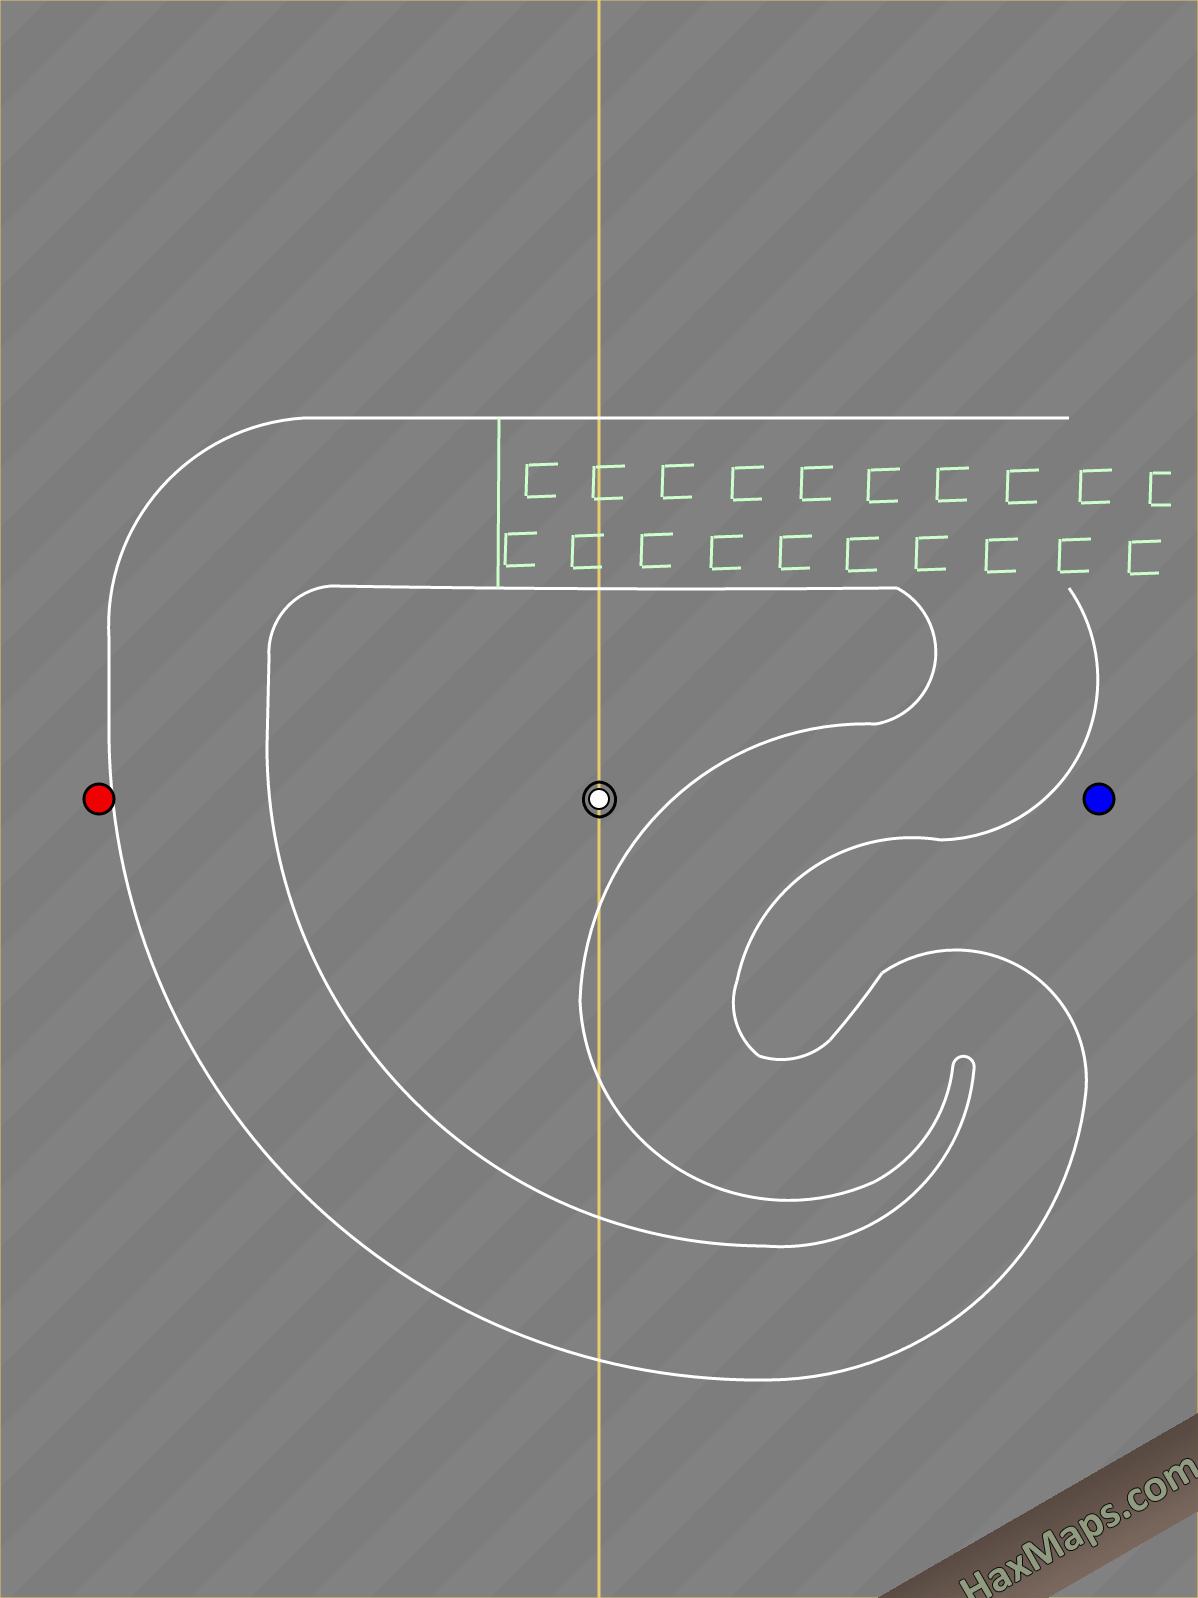 hax ball maps | Race CR Kagawa LKH